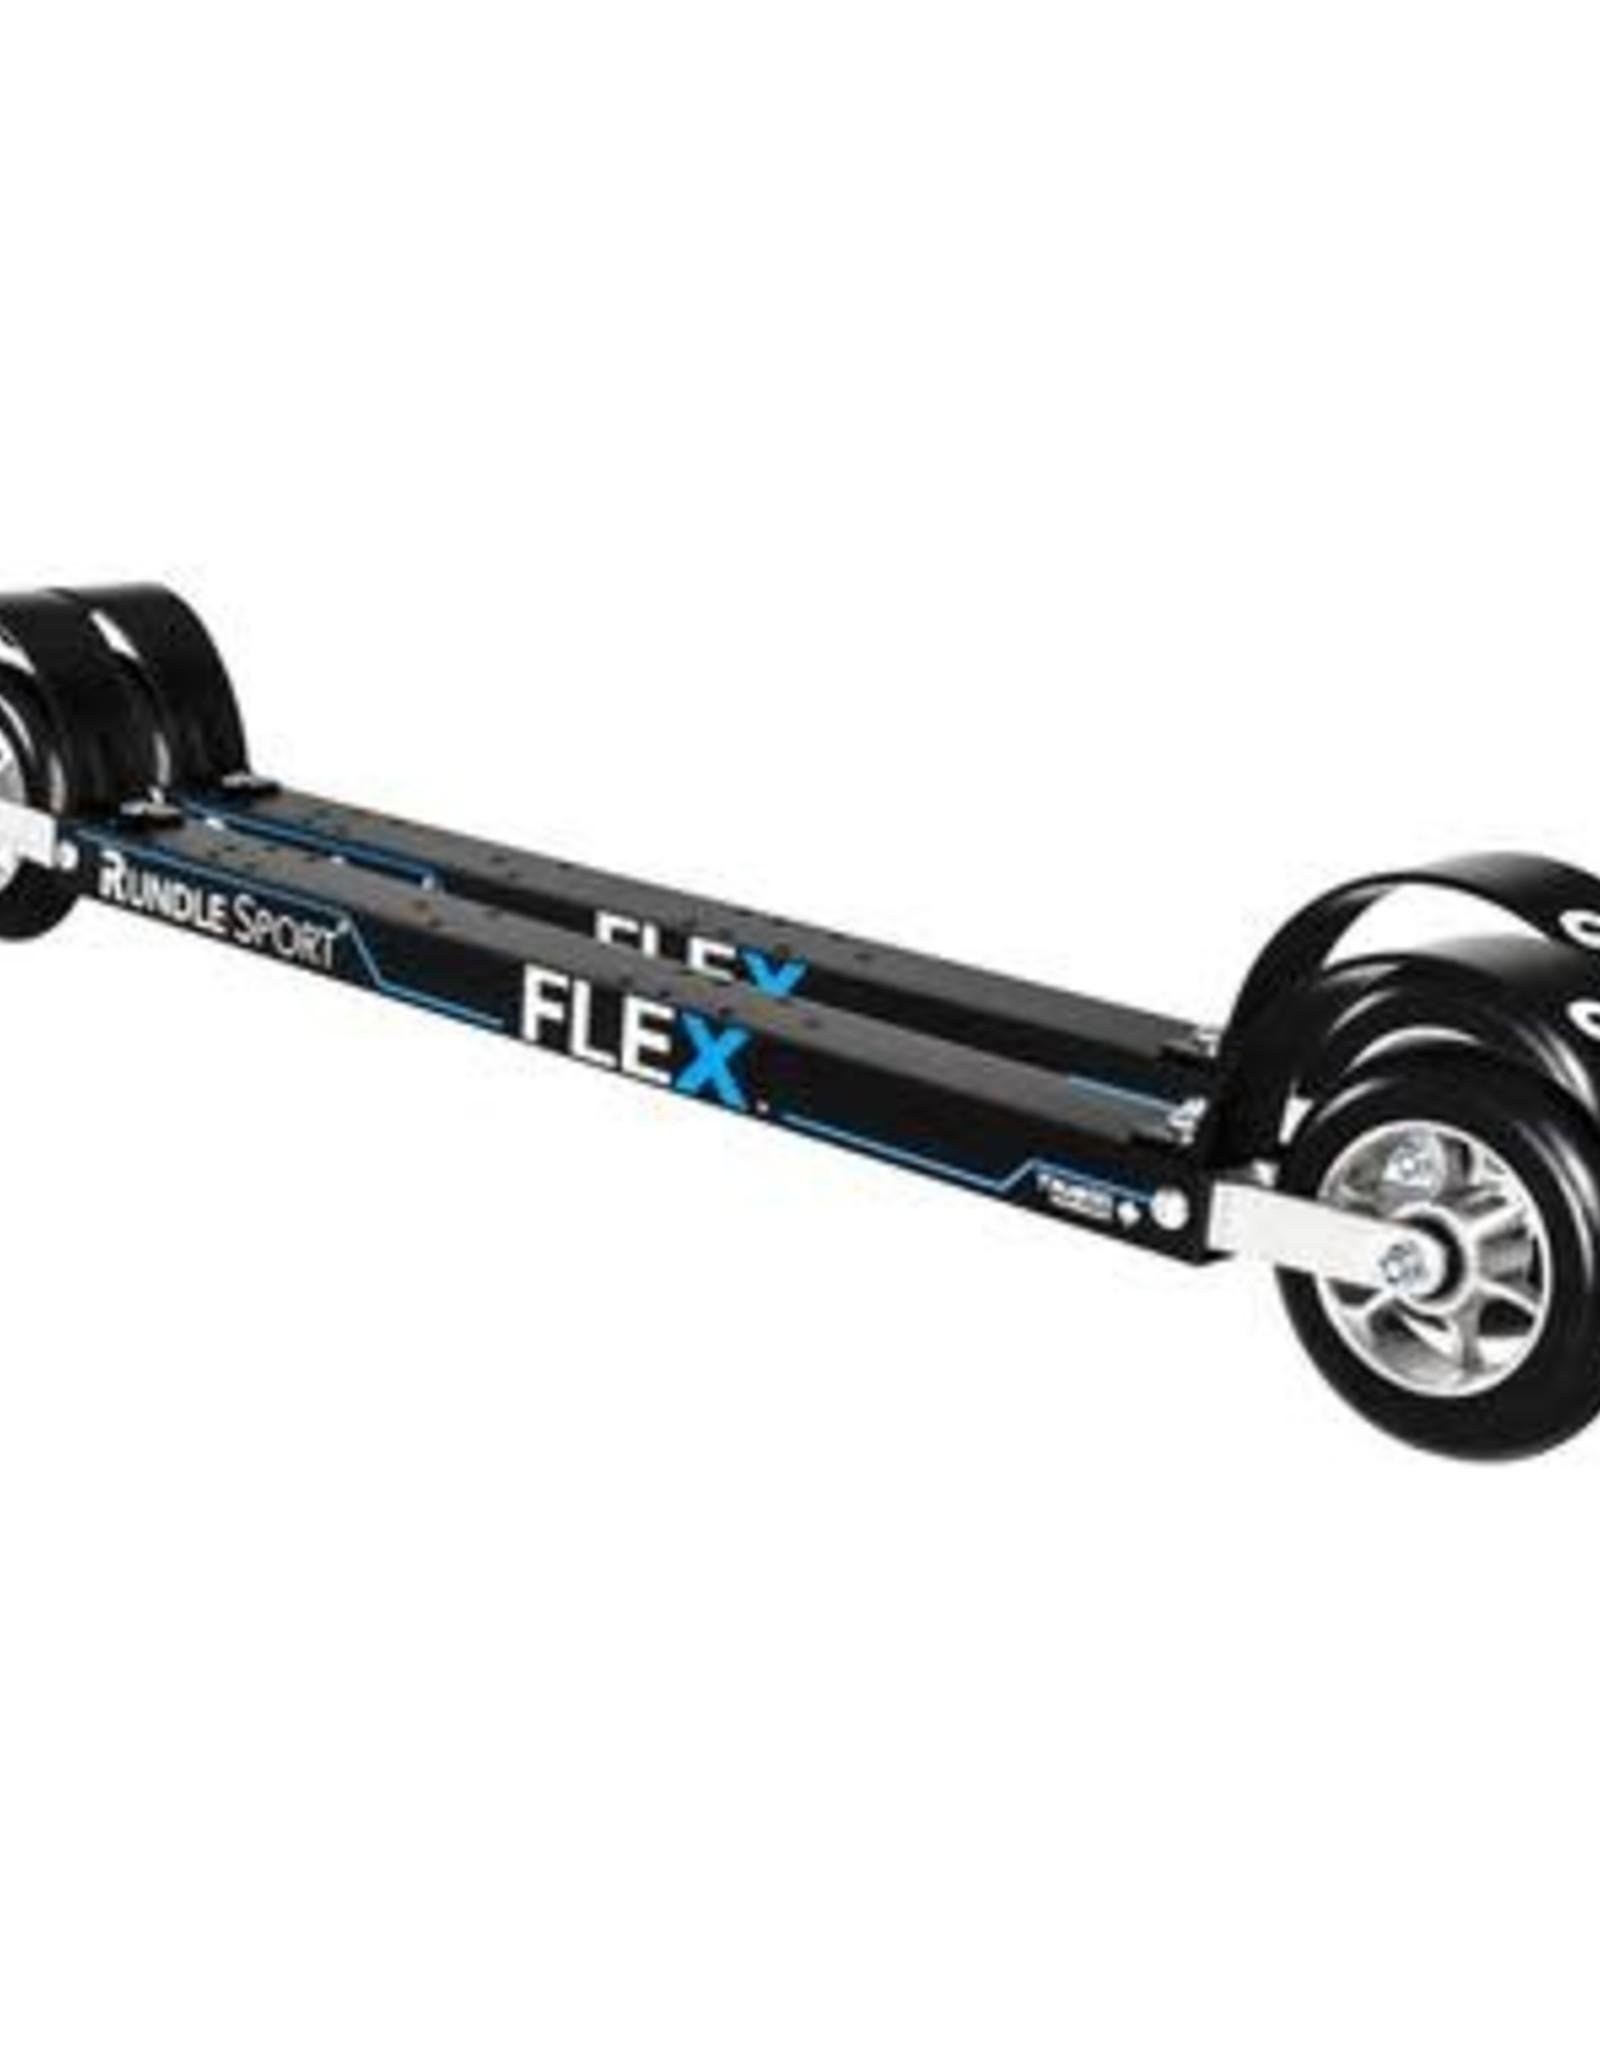 Rundle Sport inc. Flex Skate